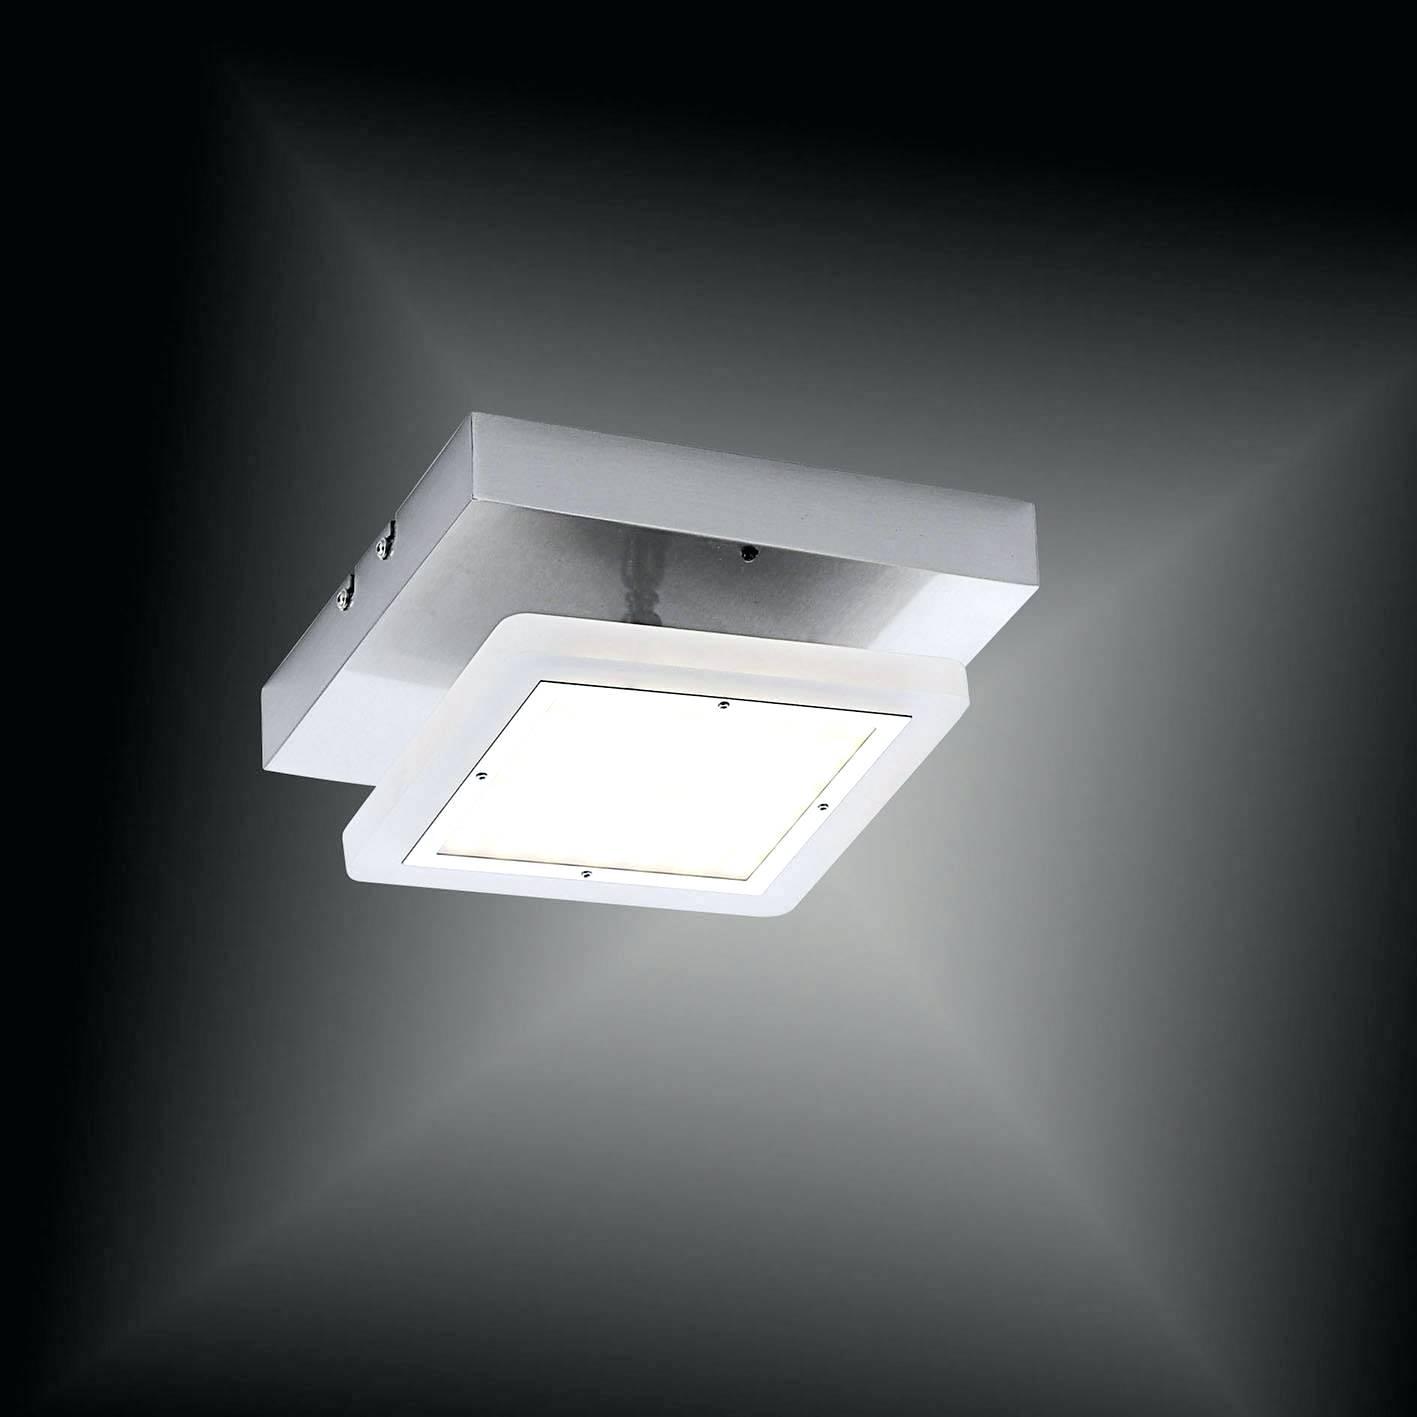 Lampe neuhaus design